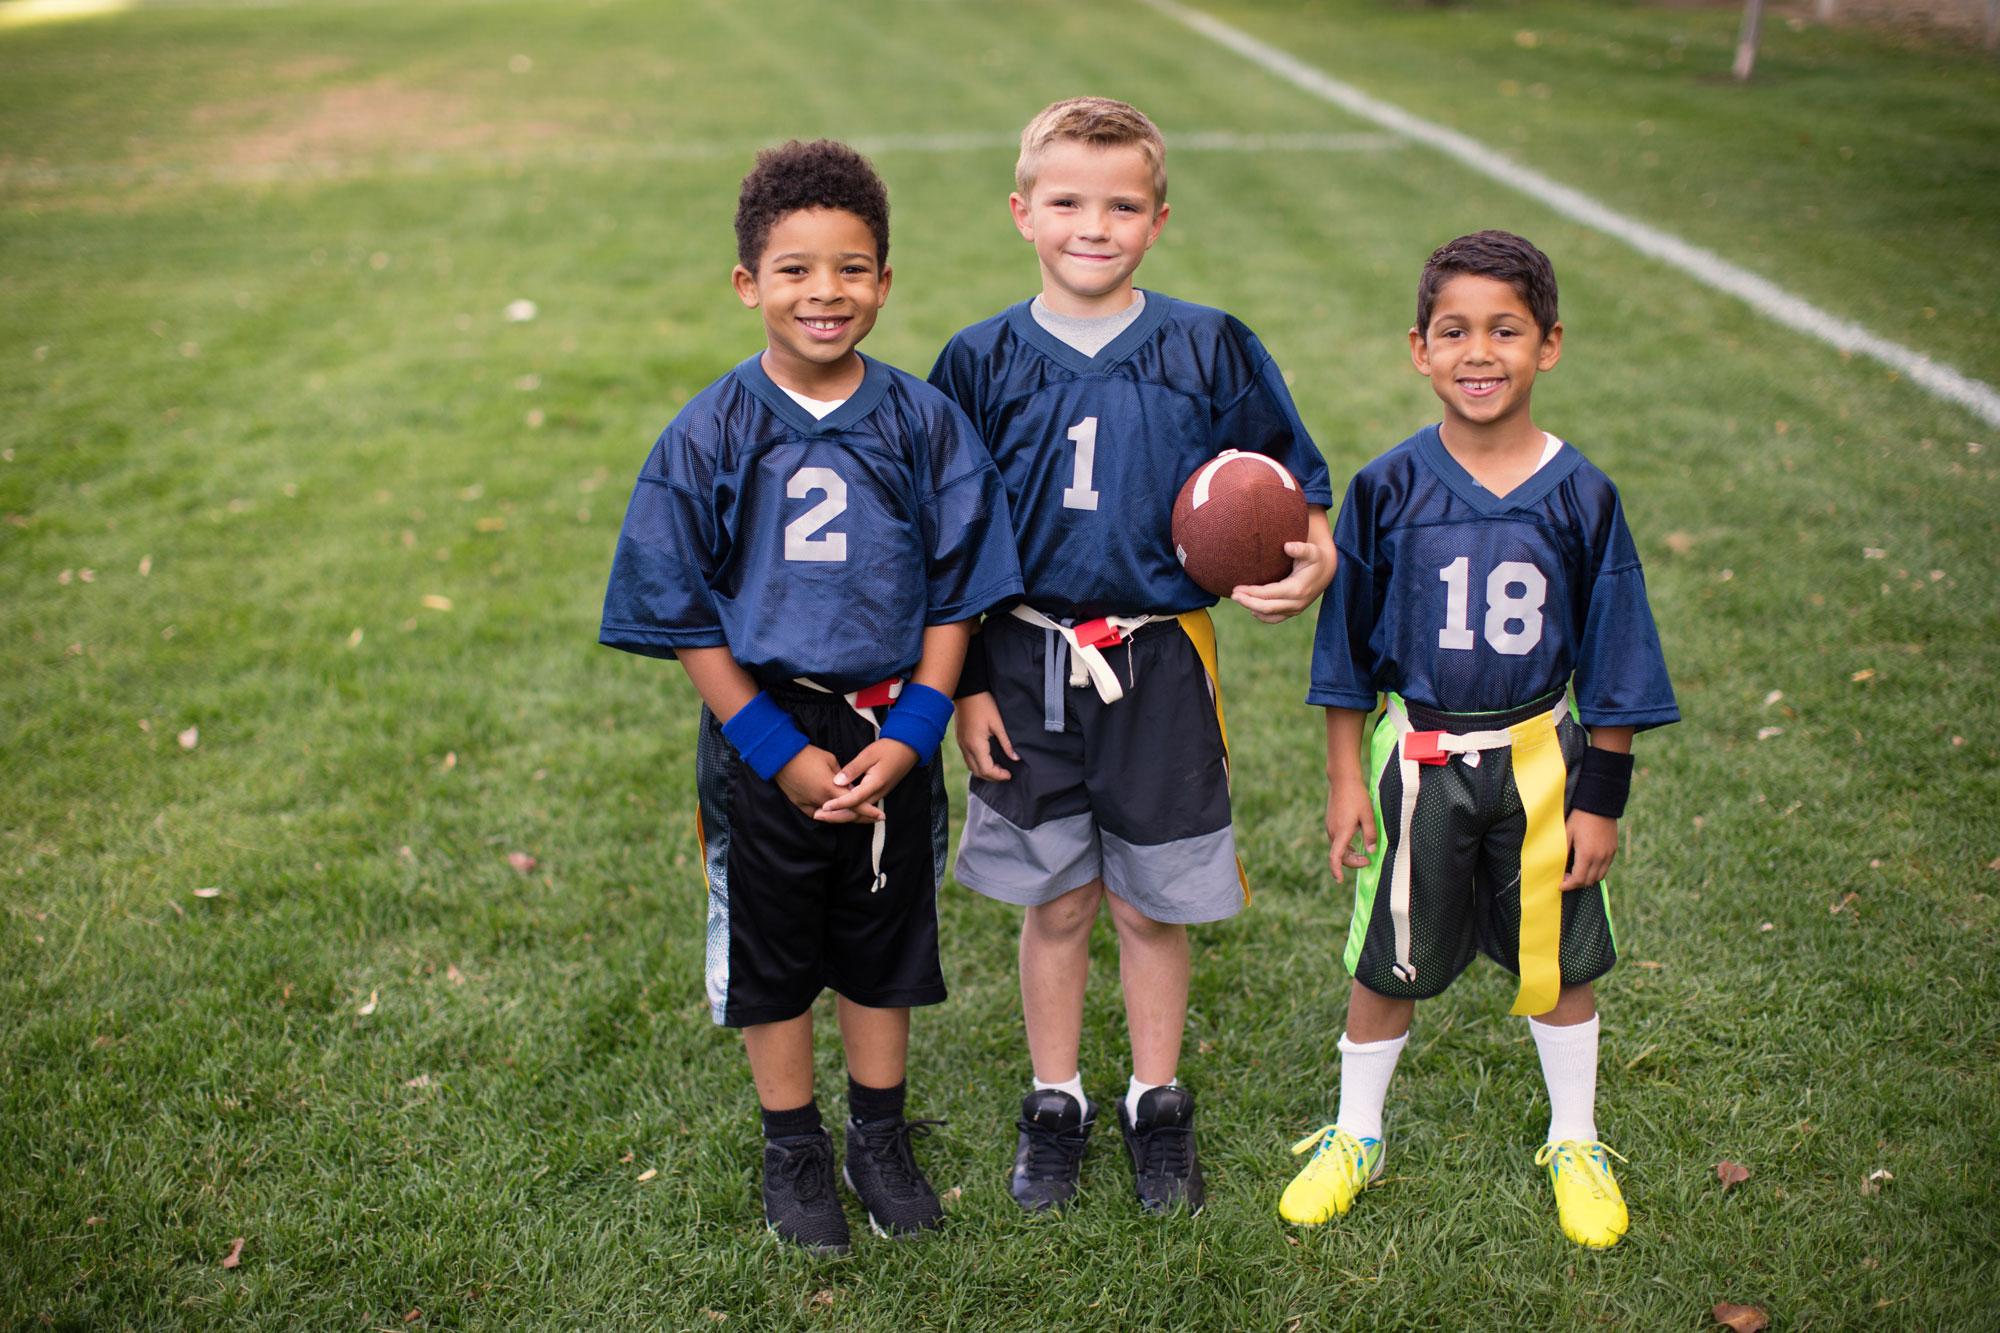 Three boys on a flag football team pose together.